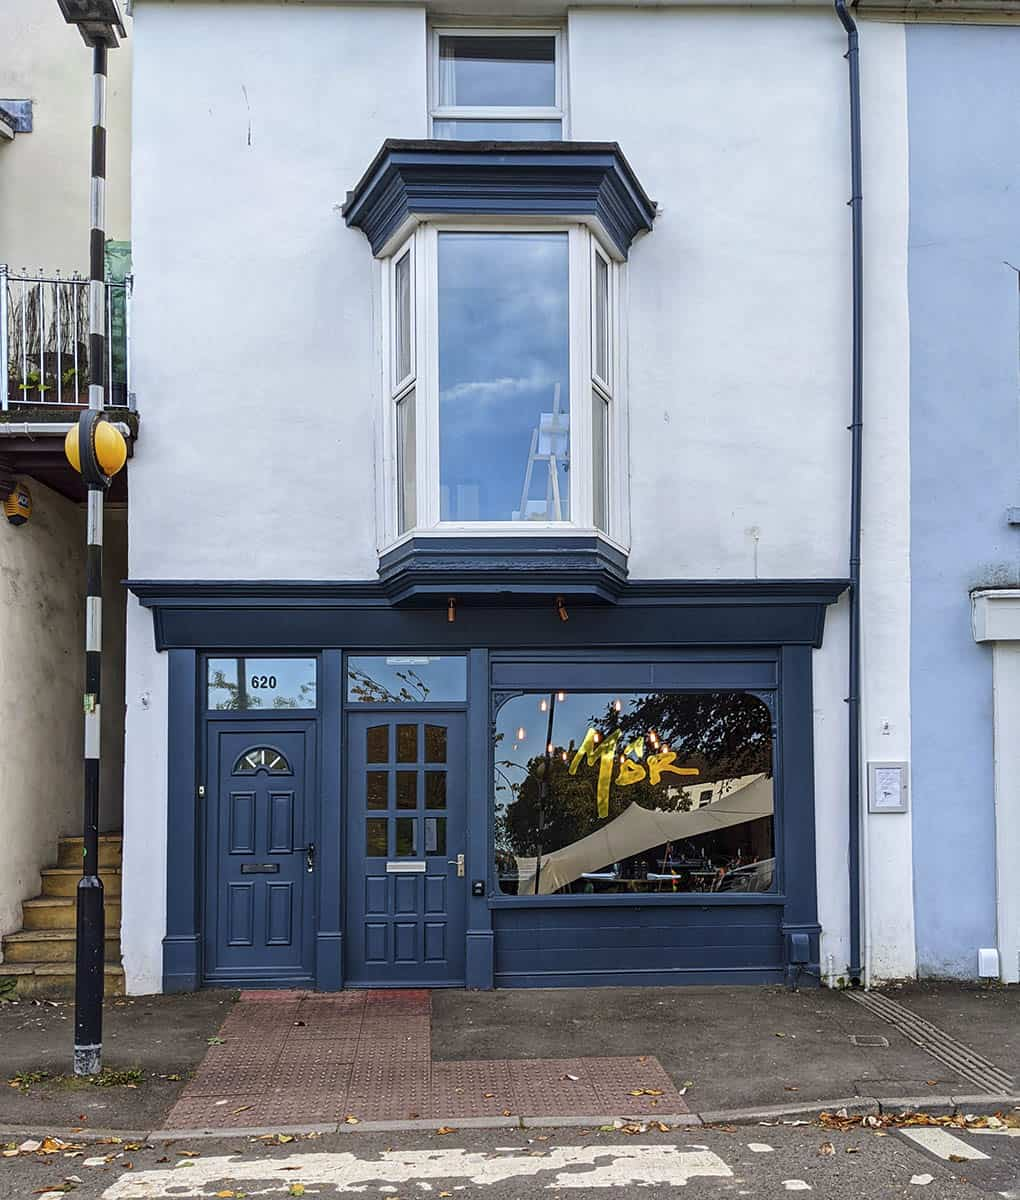 The street facade of a restaurant called Môr